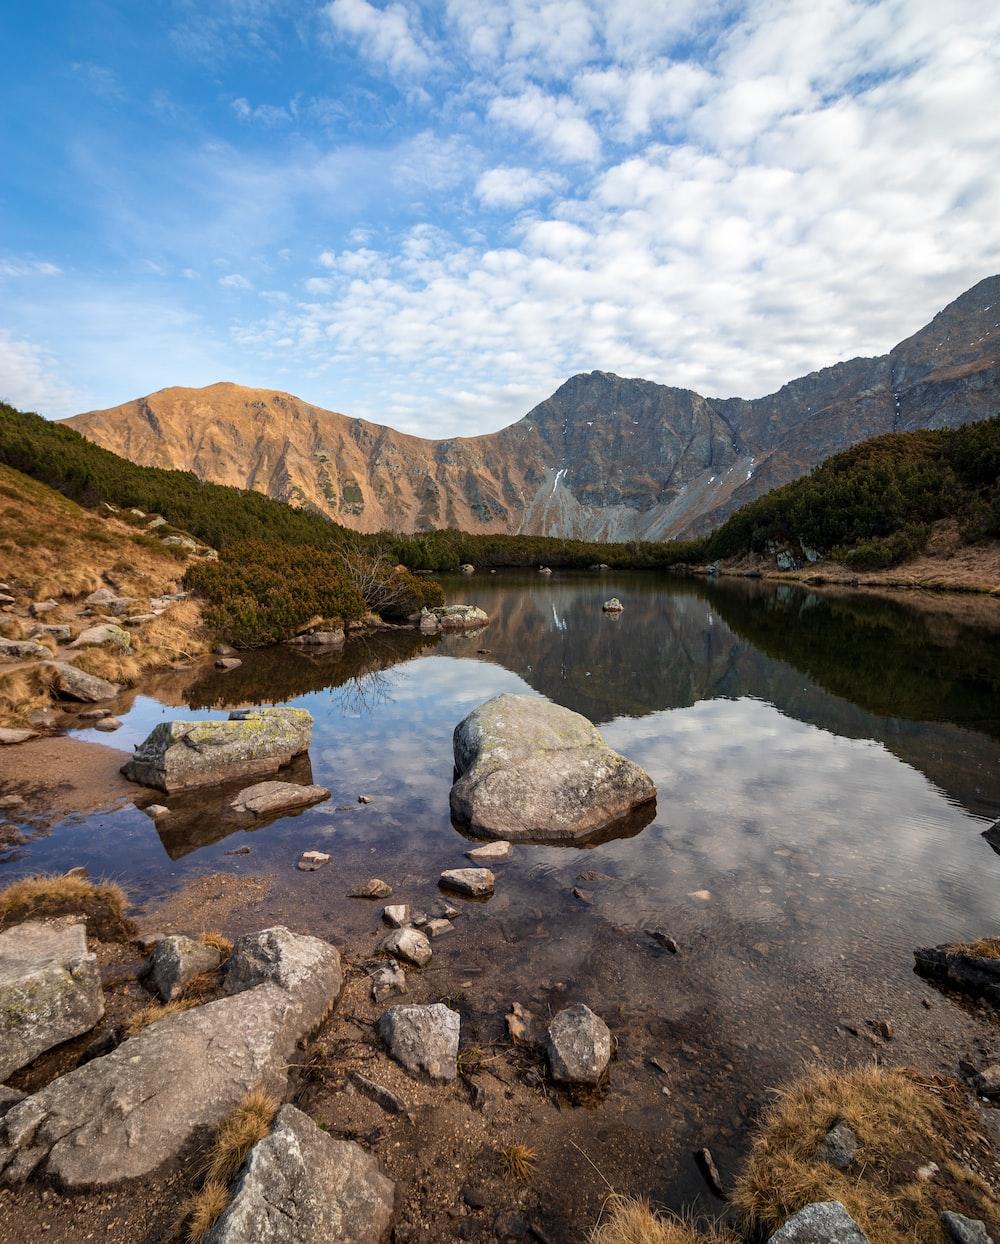 rocks in body of water facing mountain under blue sky